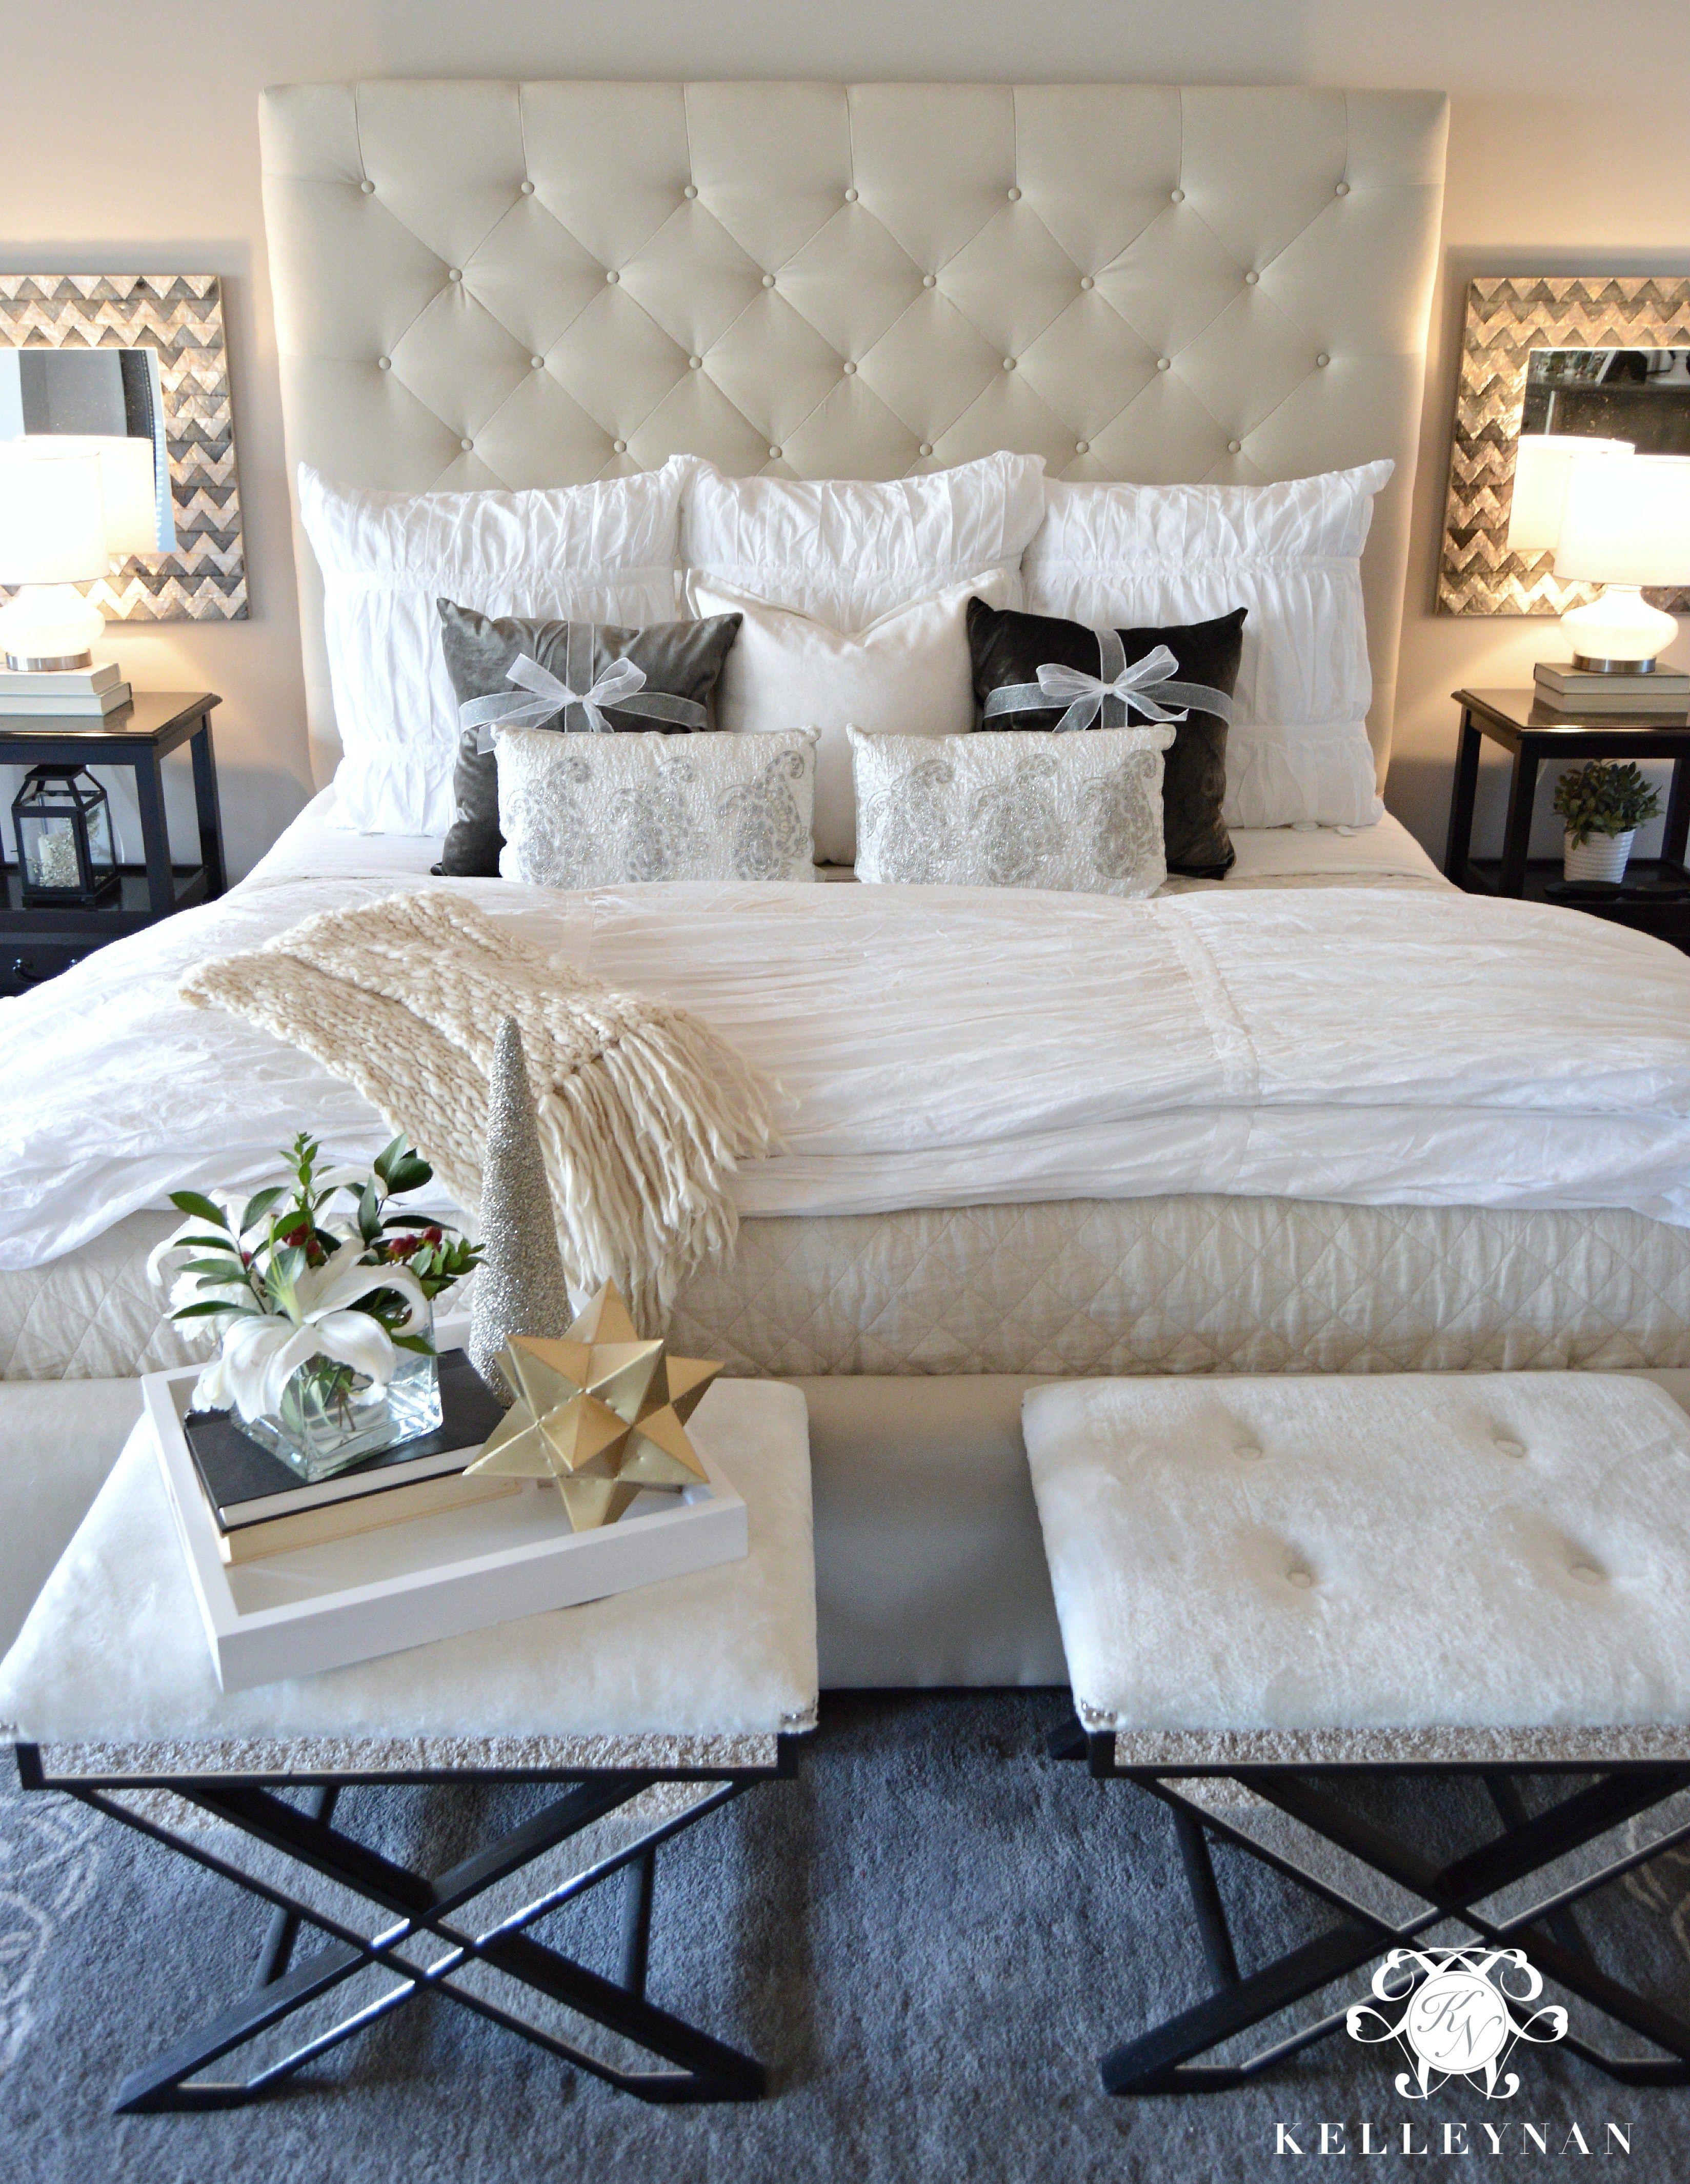 pottery barn lorraine bed on 2015 christmas home tour kelley nan home bedroom home decor bedroom bedroom inspirations 2015 christmas home tour kelley nan